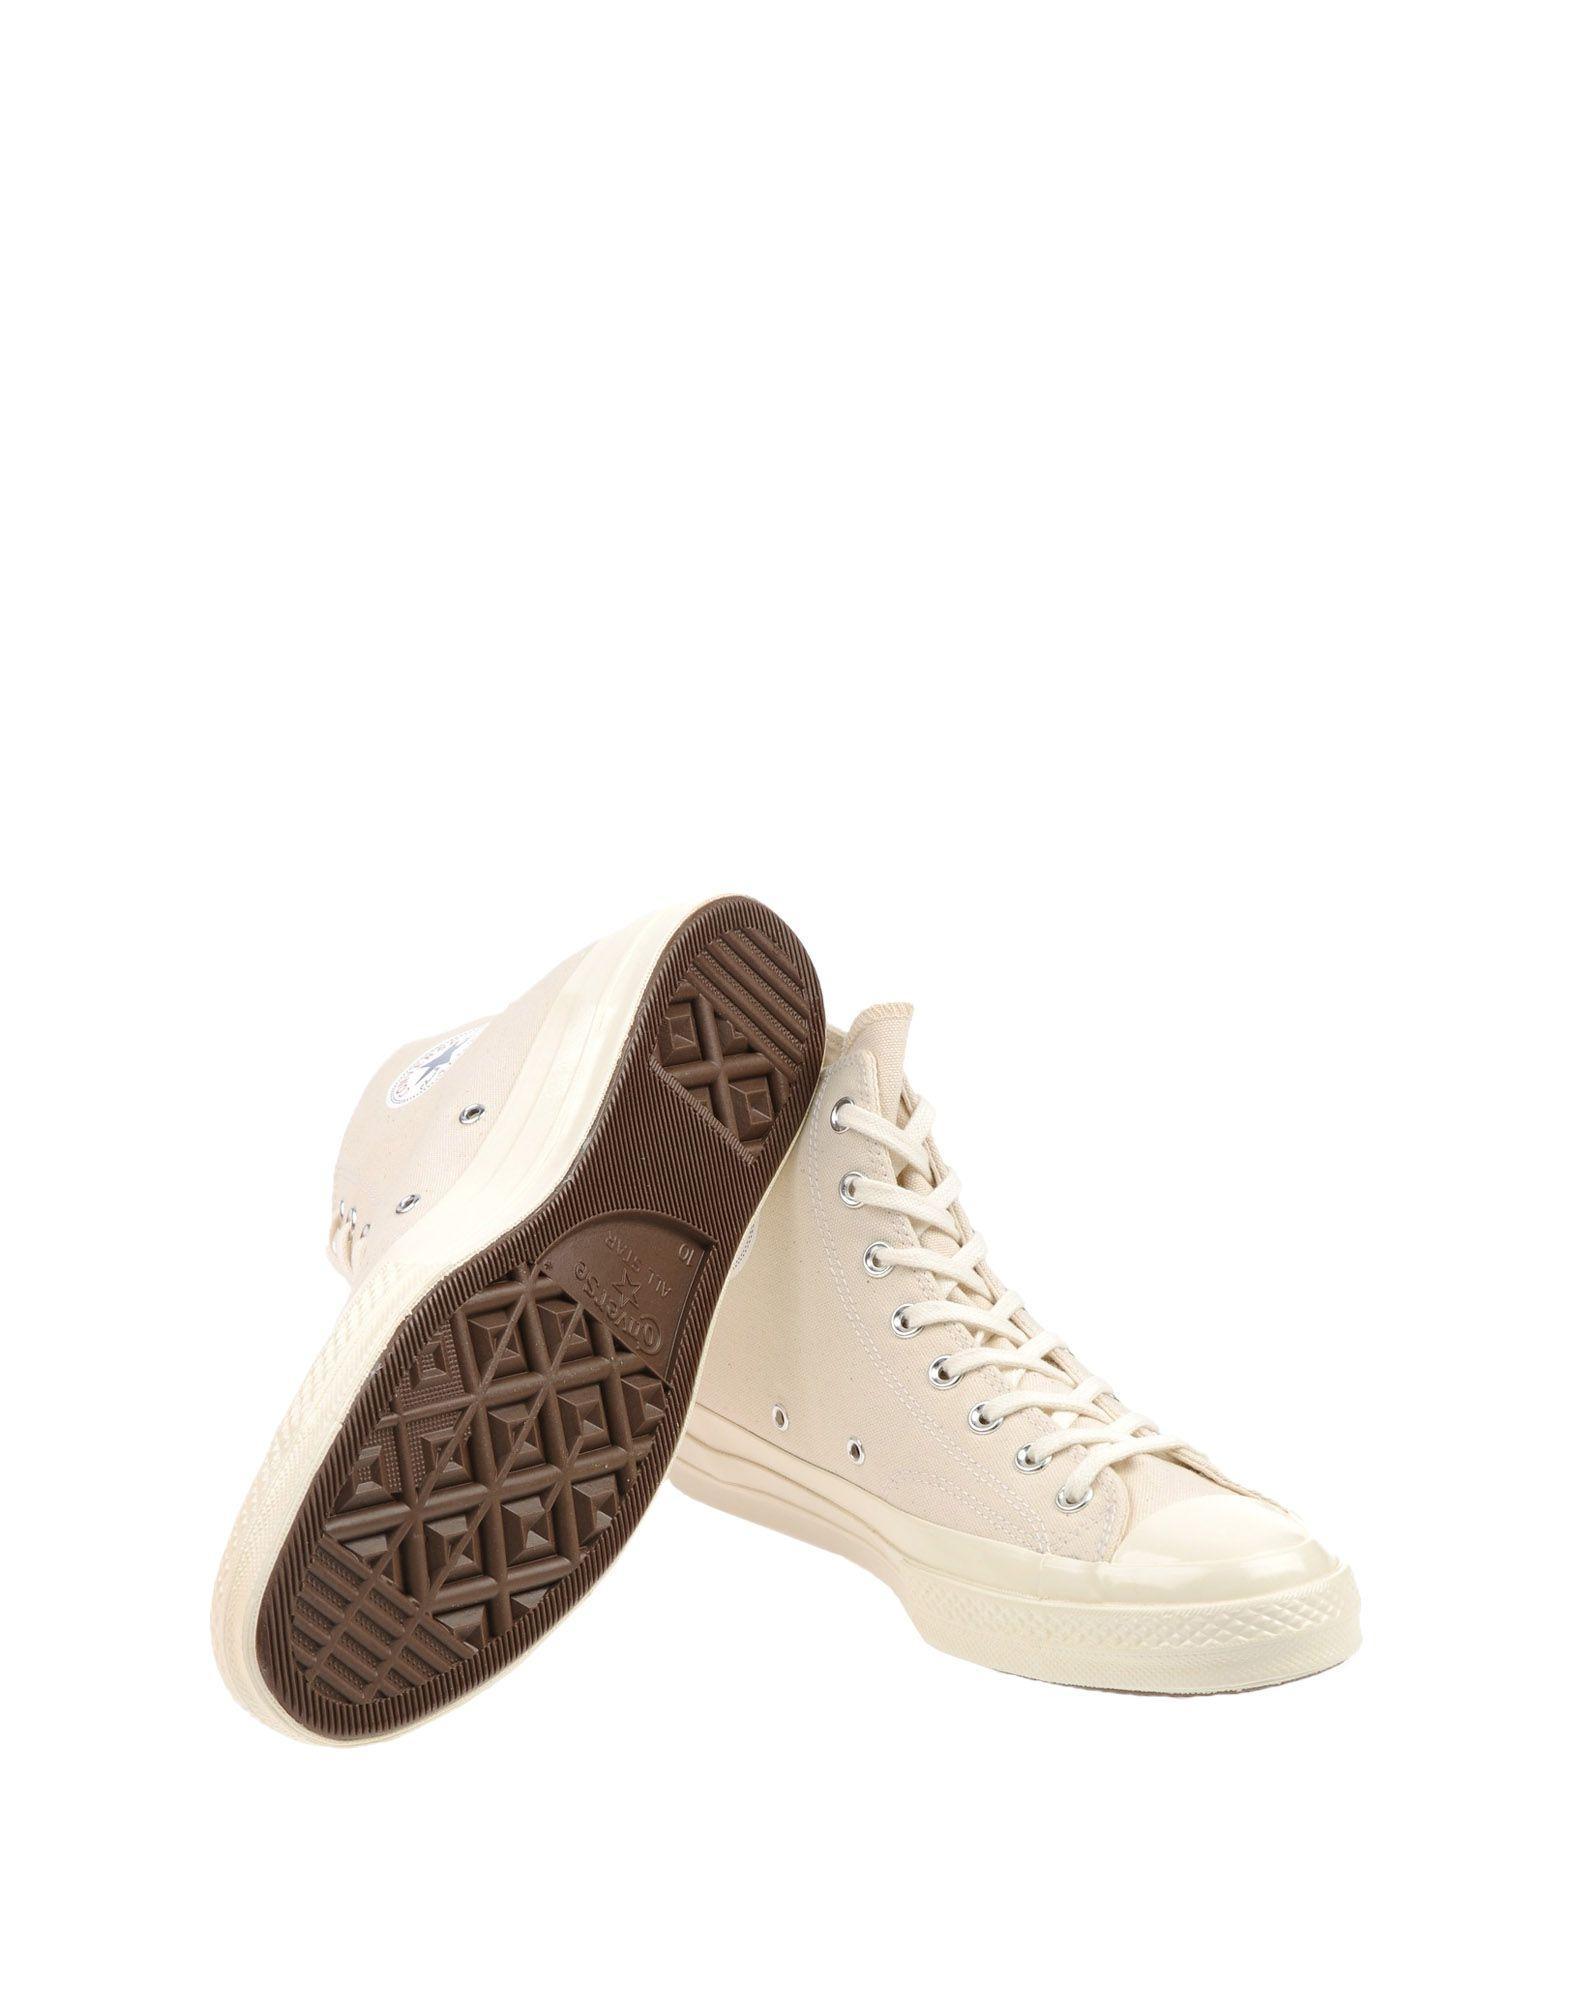 Rabatt echte Schuhe Converse All Star All Star Prem 11015691WB Hi 1970'S Canvas  11015691WB Prem bf82f2